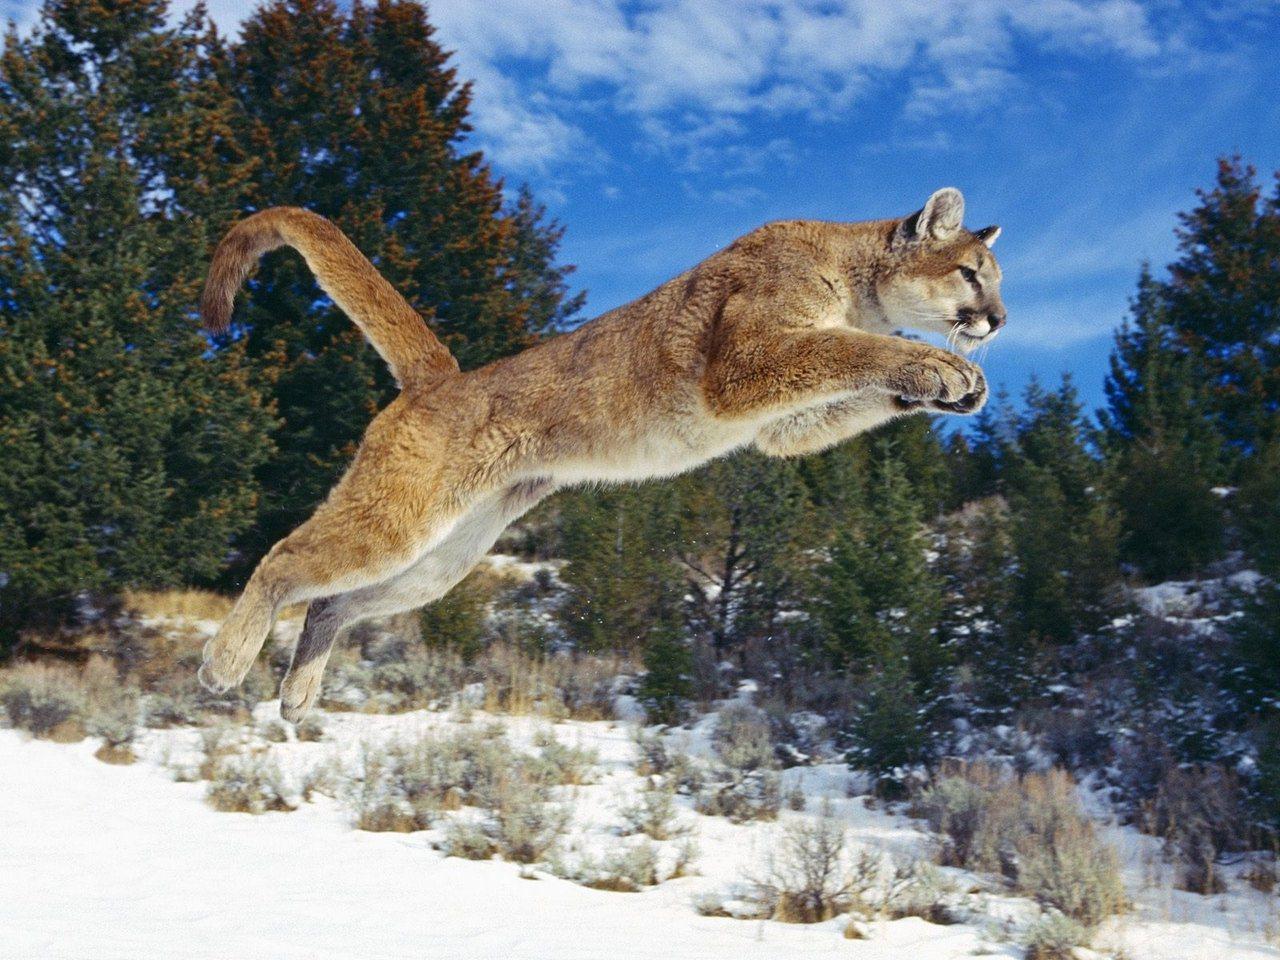 http://3.bp.blogspot.com/-s5lenz4YO9Q/TvN3yIKDQjI/AAAAAAAAZjM/ShH3Lx7R8cI/s1600/Amazing+Set+of+Wild+Cats+Wallpapers+%252820%2529.jpg